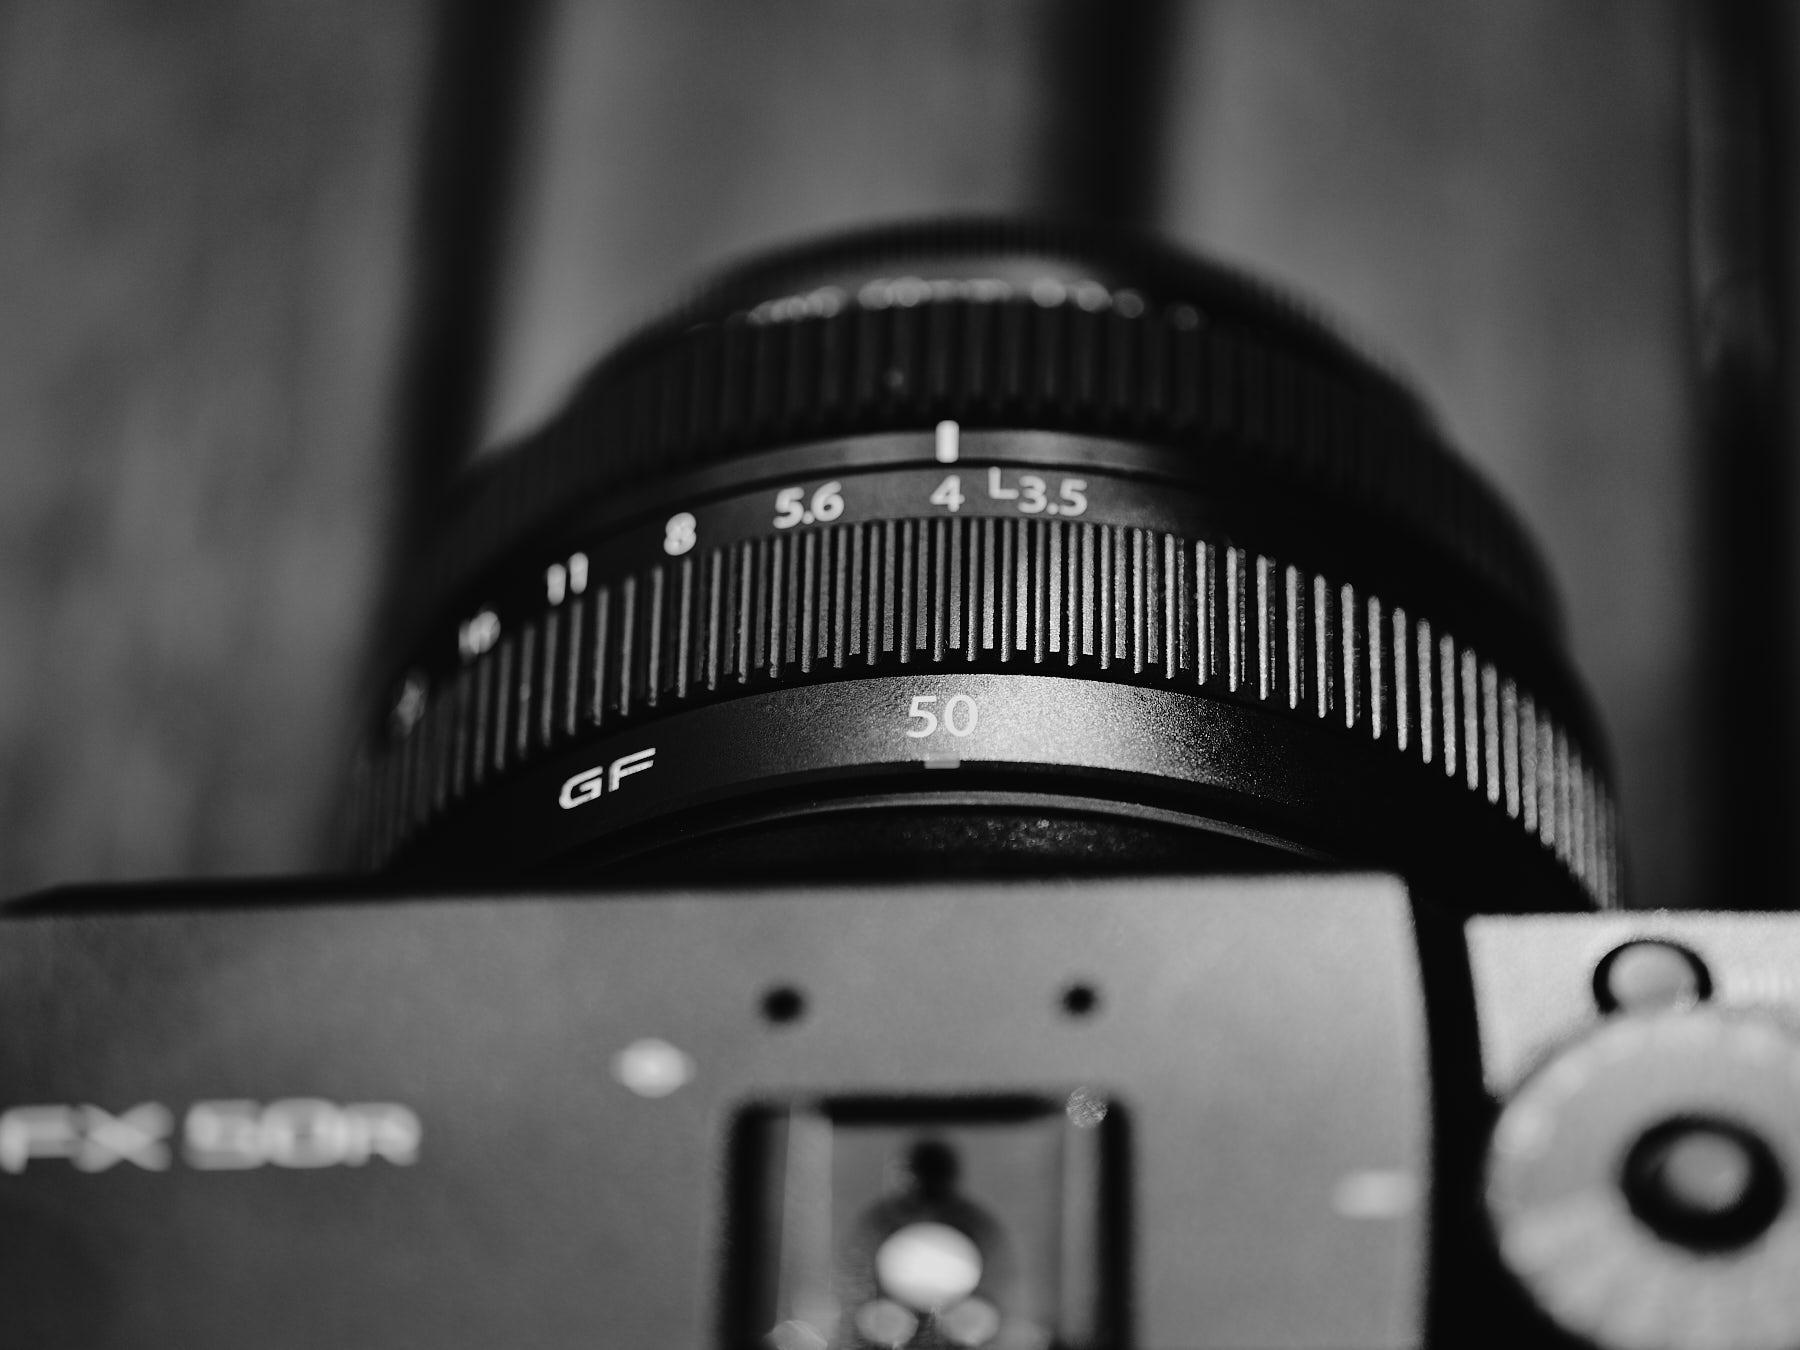 laROQUE-GF50mm-004.jpg